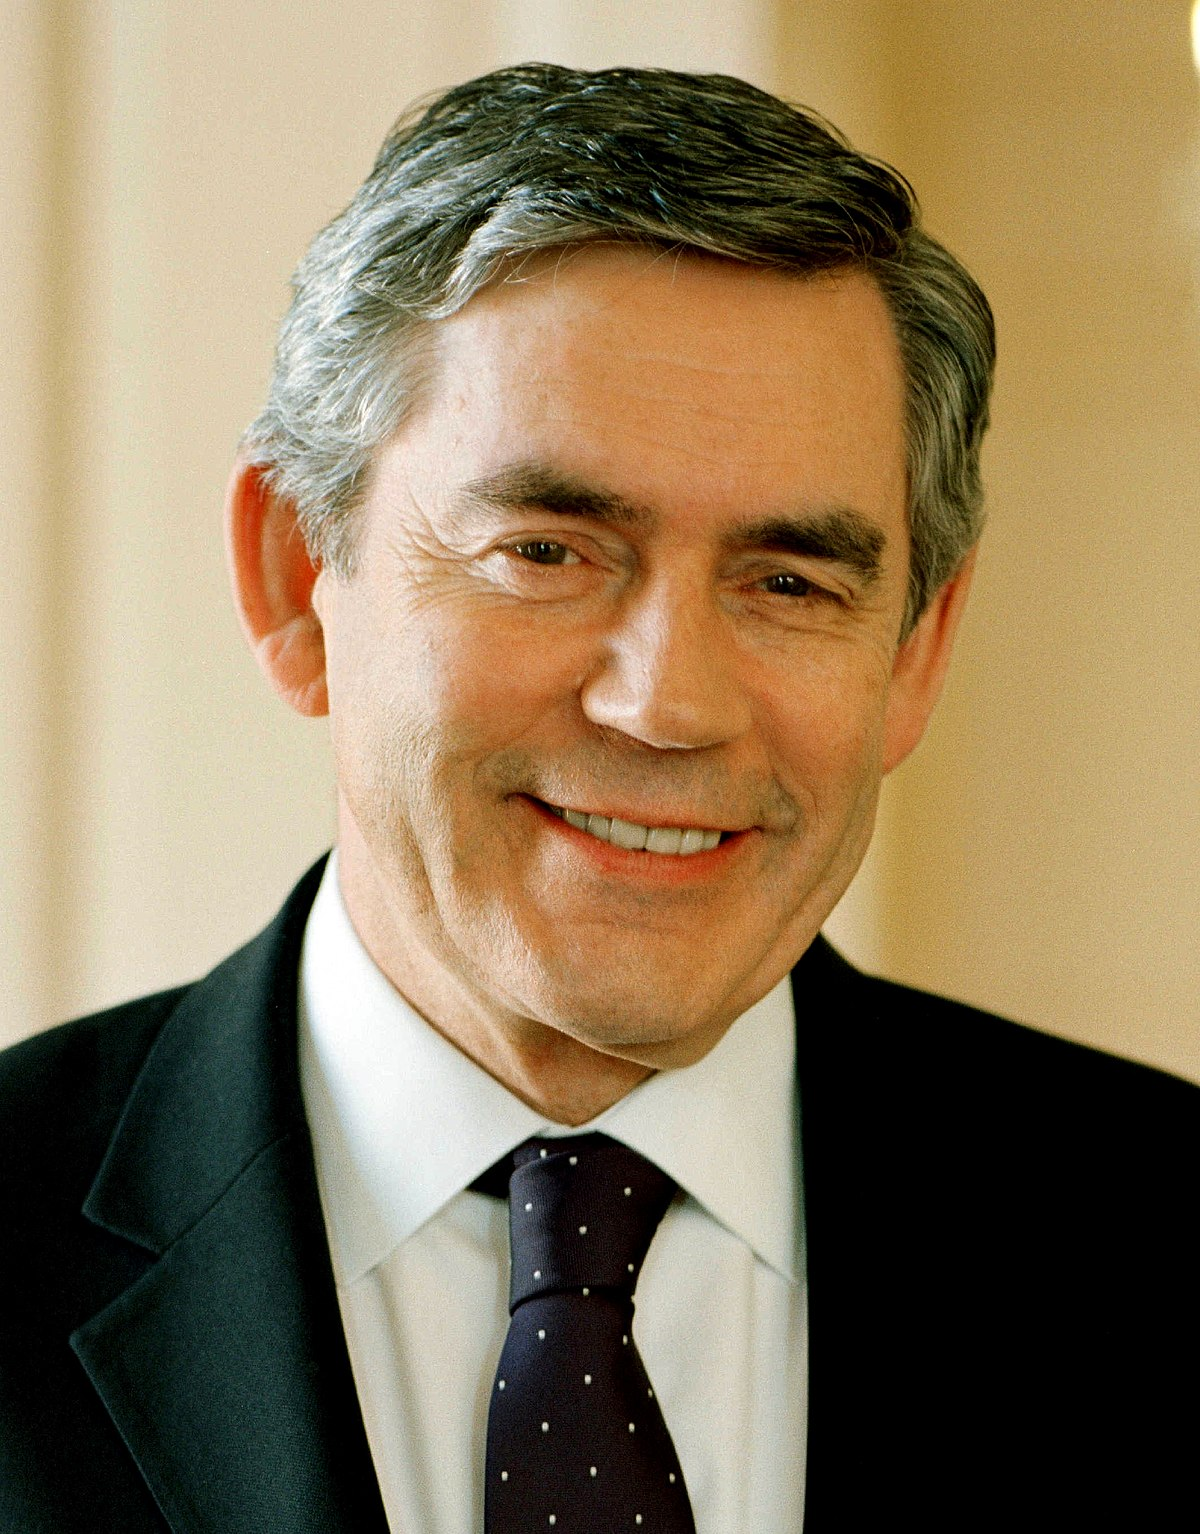 Gordon Brown British Actor, Politician